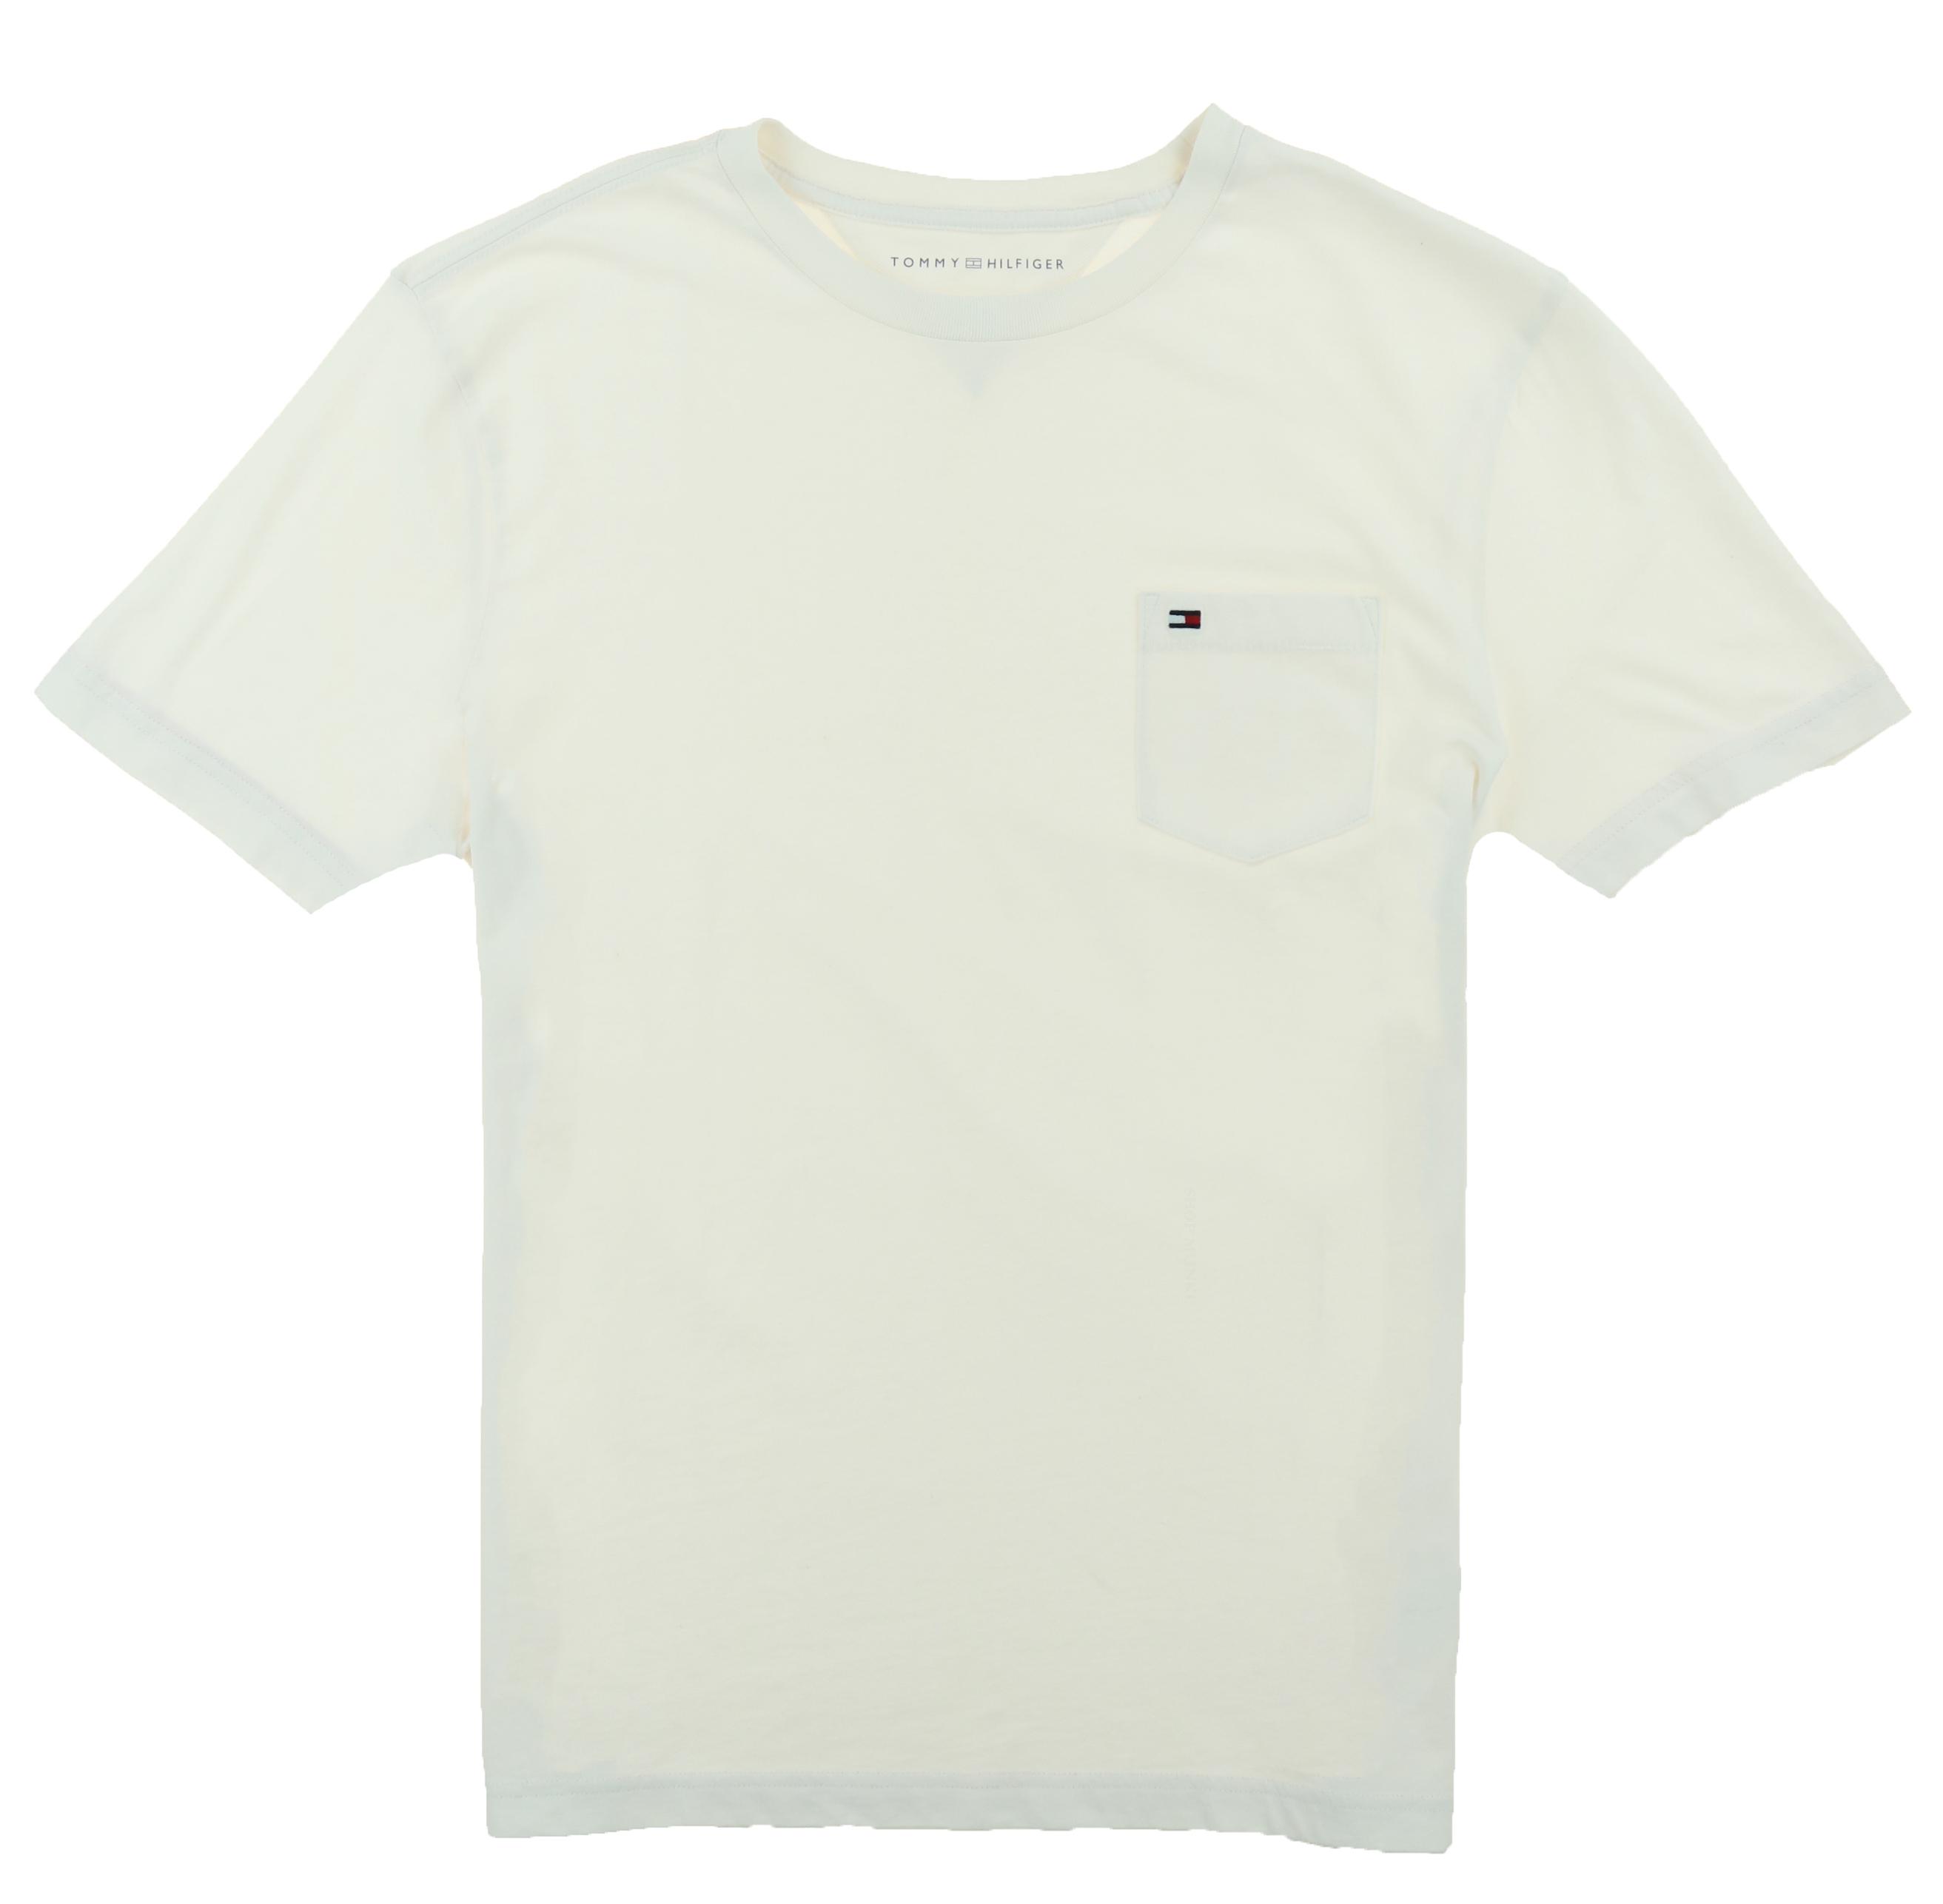 Tommy-Hilfiger-Mens-Crew-Neck-Pocket-T-shirt thumbnail 4